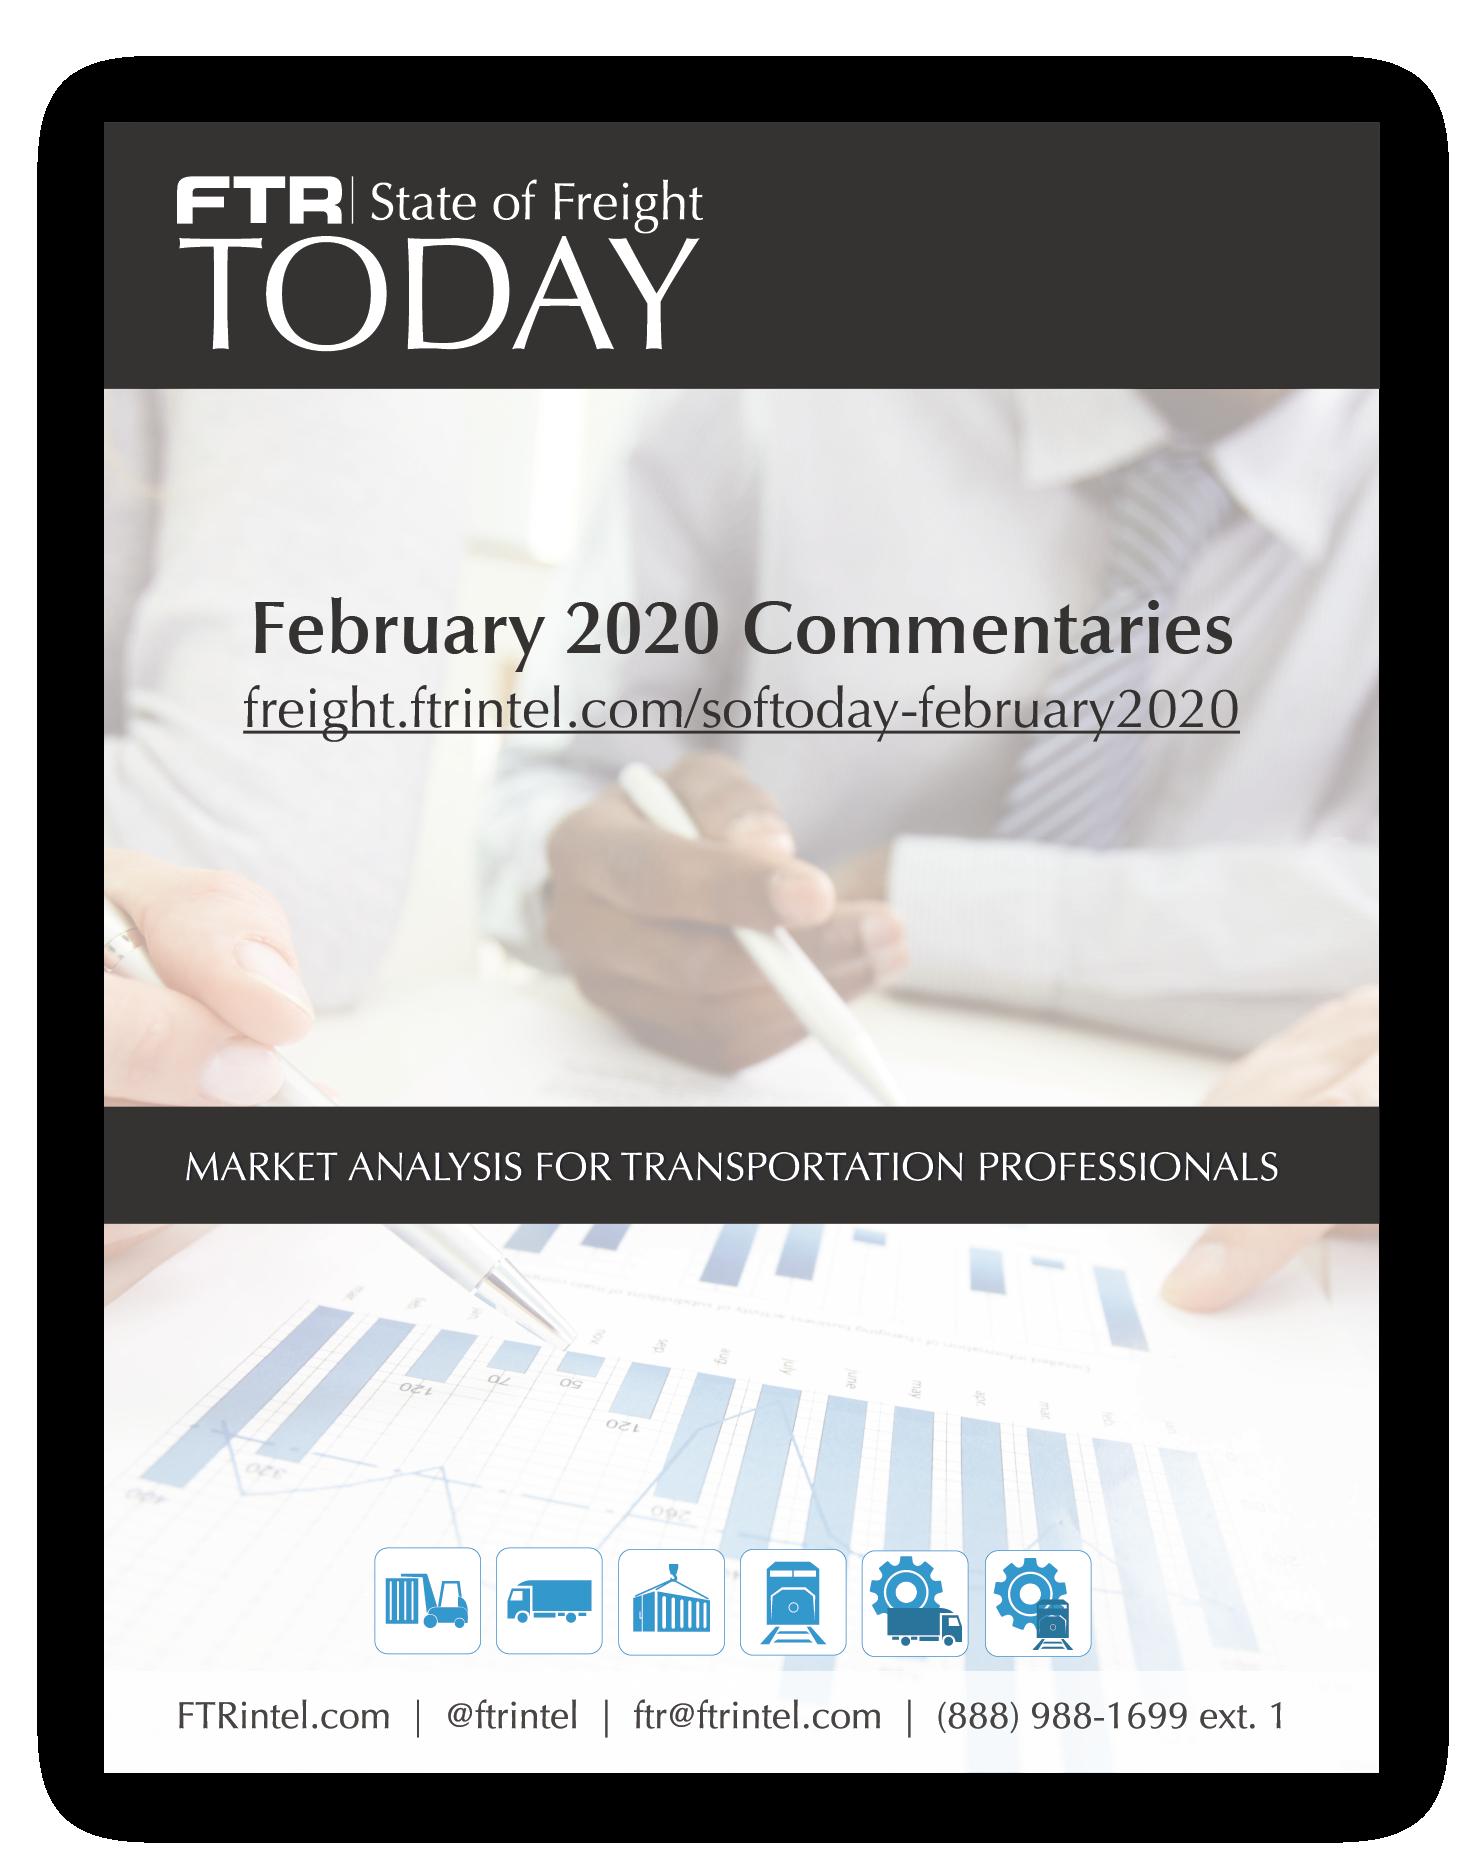 FTR_SOF_TODAY_2020-February-Image